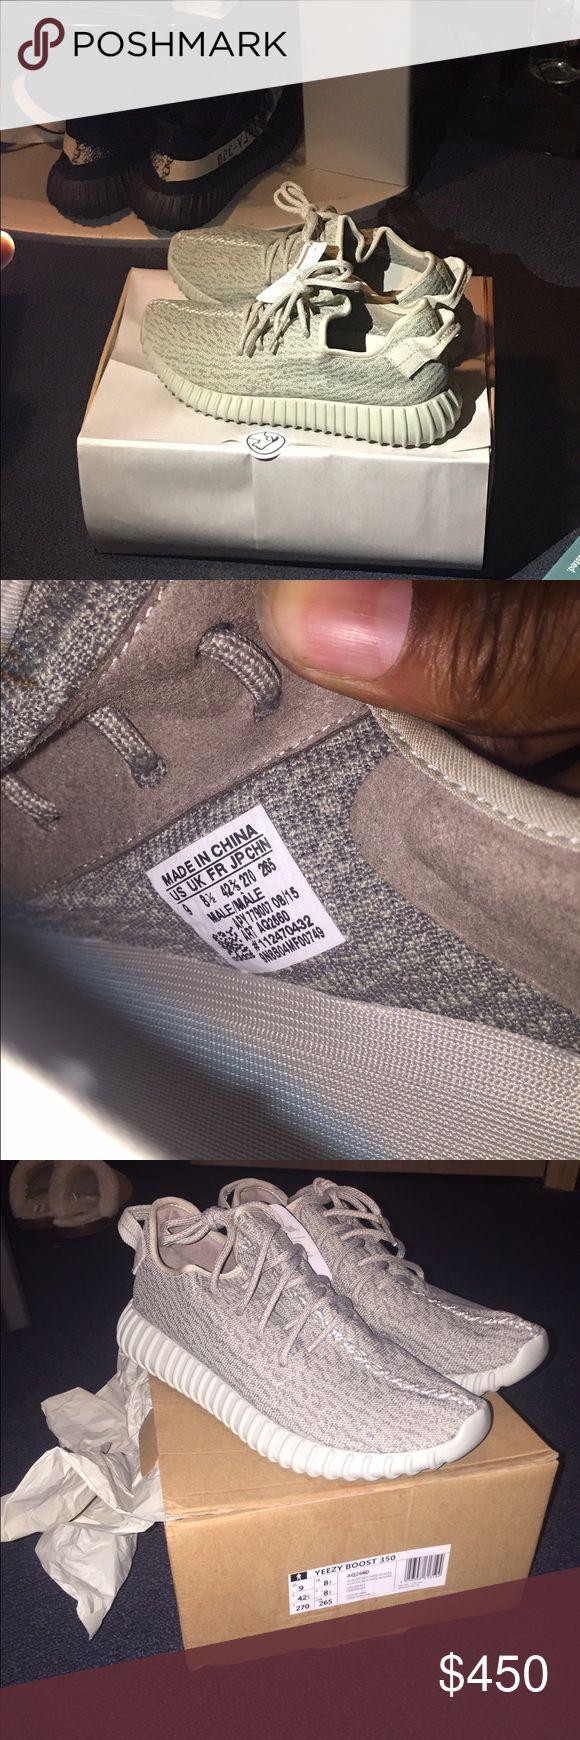 Yeezy Boost 350 Moonrock Brand new Yeezy Shoes Sneakers